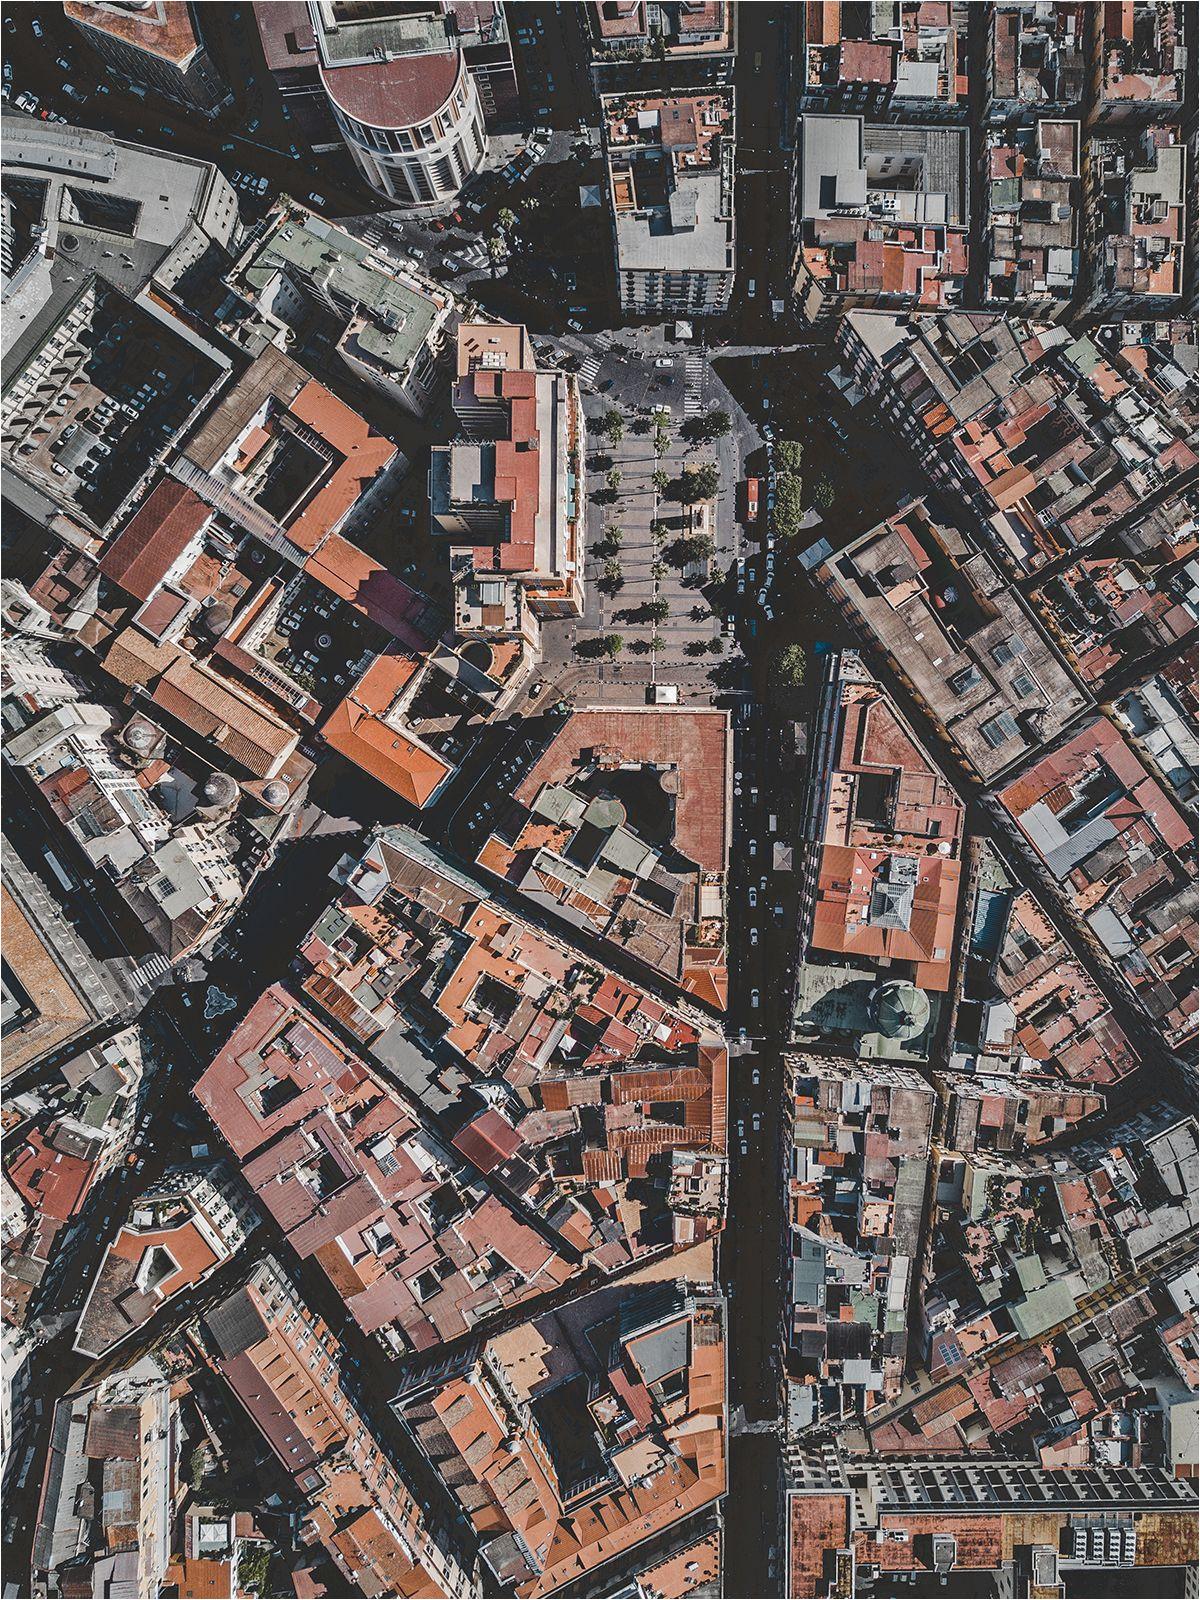 naples italy satelital maps naples city layout plaza design